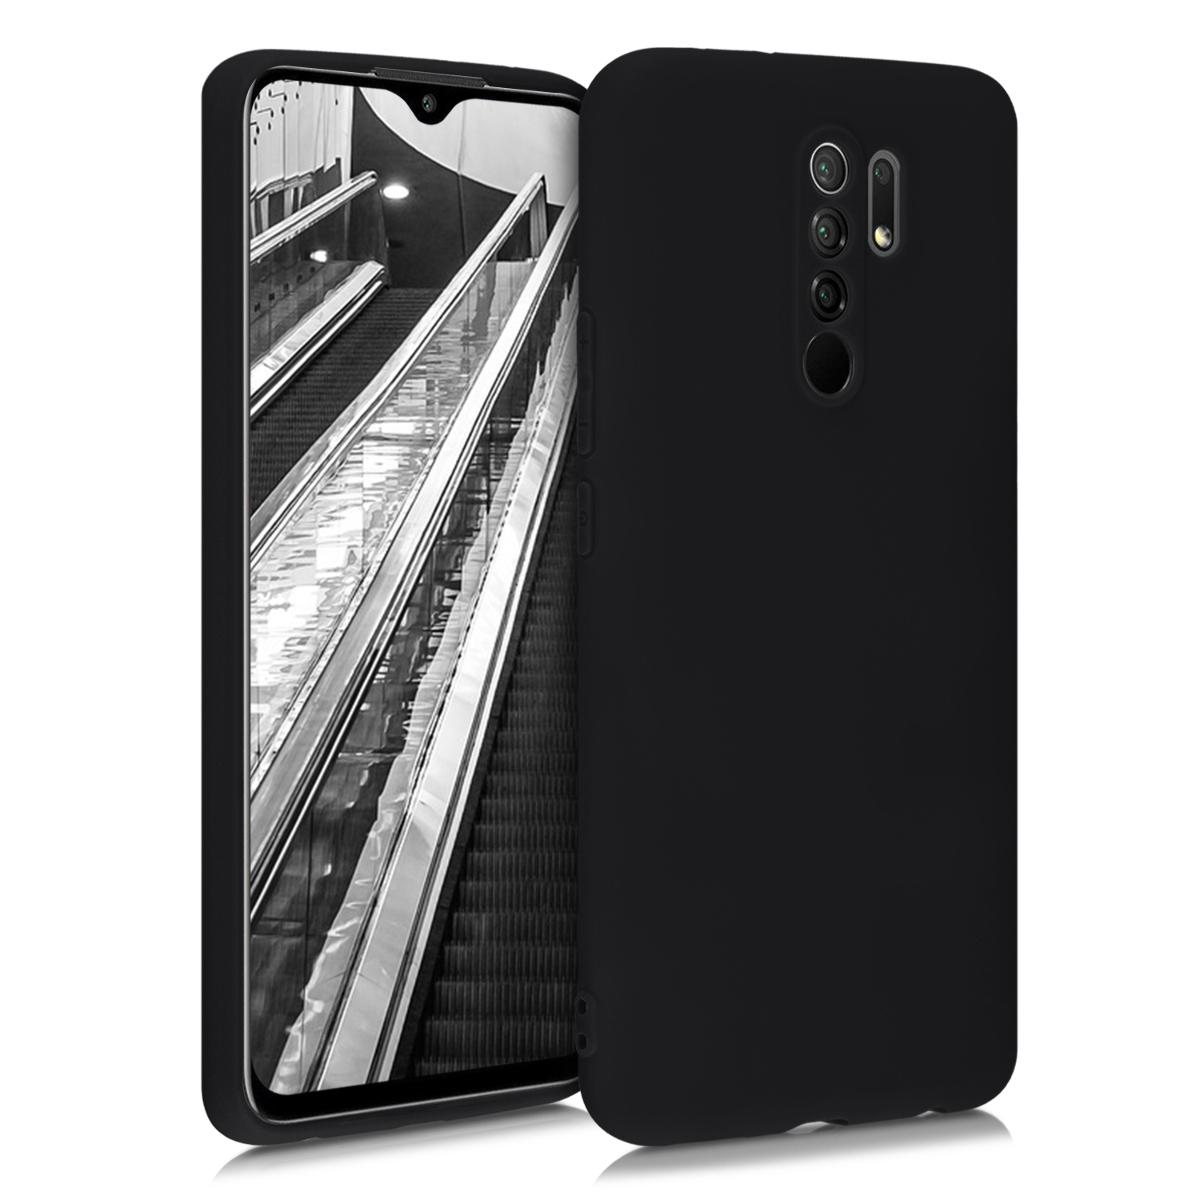 Kvalitní silikonové TPU pouzdro | obal pro Xiaomi Redmi 9 - černý matný